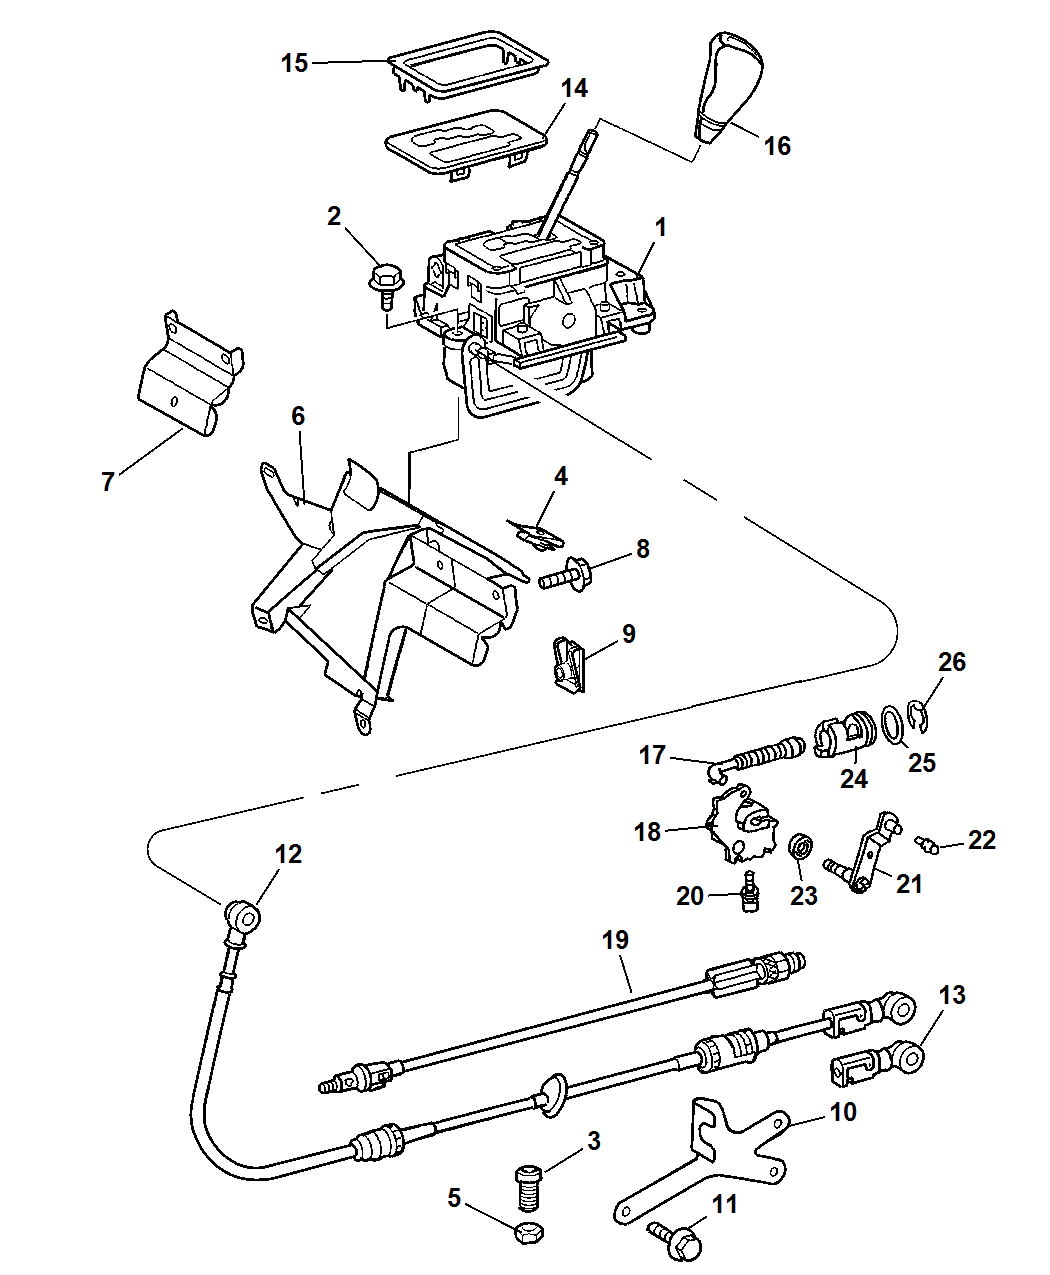 2005 Dodge Sprinter Engine Diagram - Weldex Backup Camera Wiring Diagram -  usb-cable.tukune.jeanjaures37.frWiring Diagram Resource